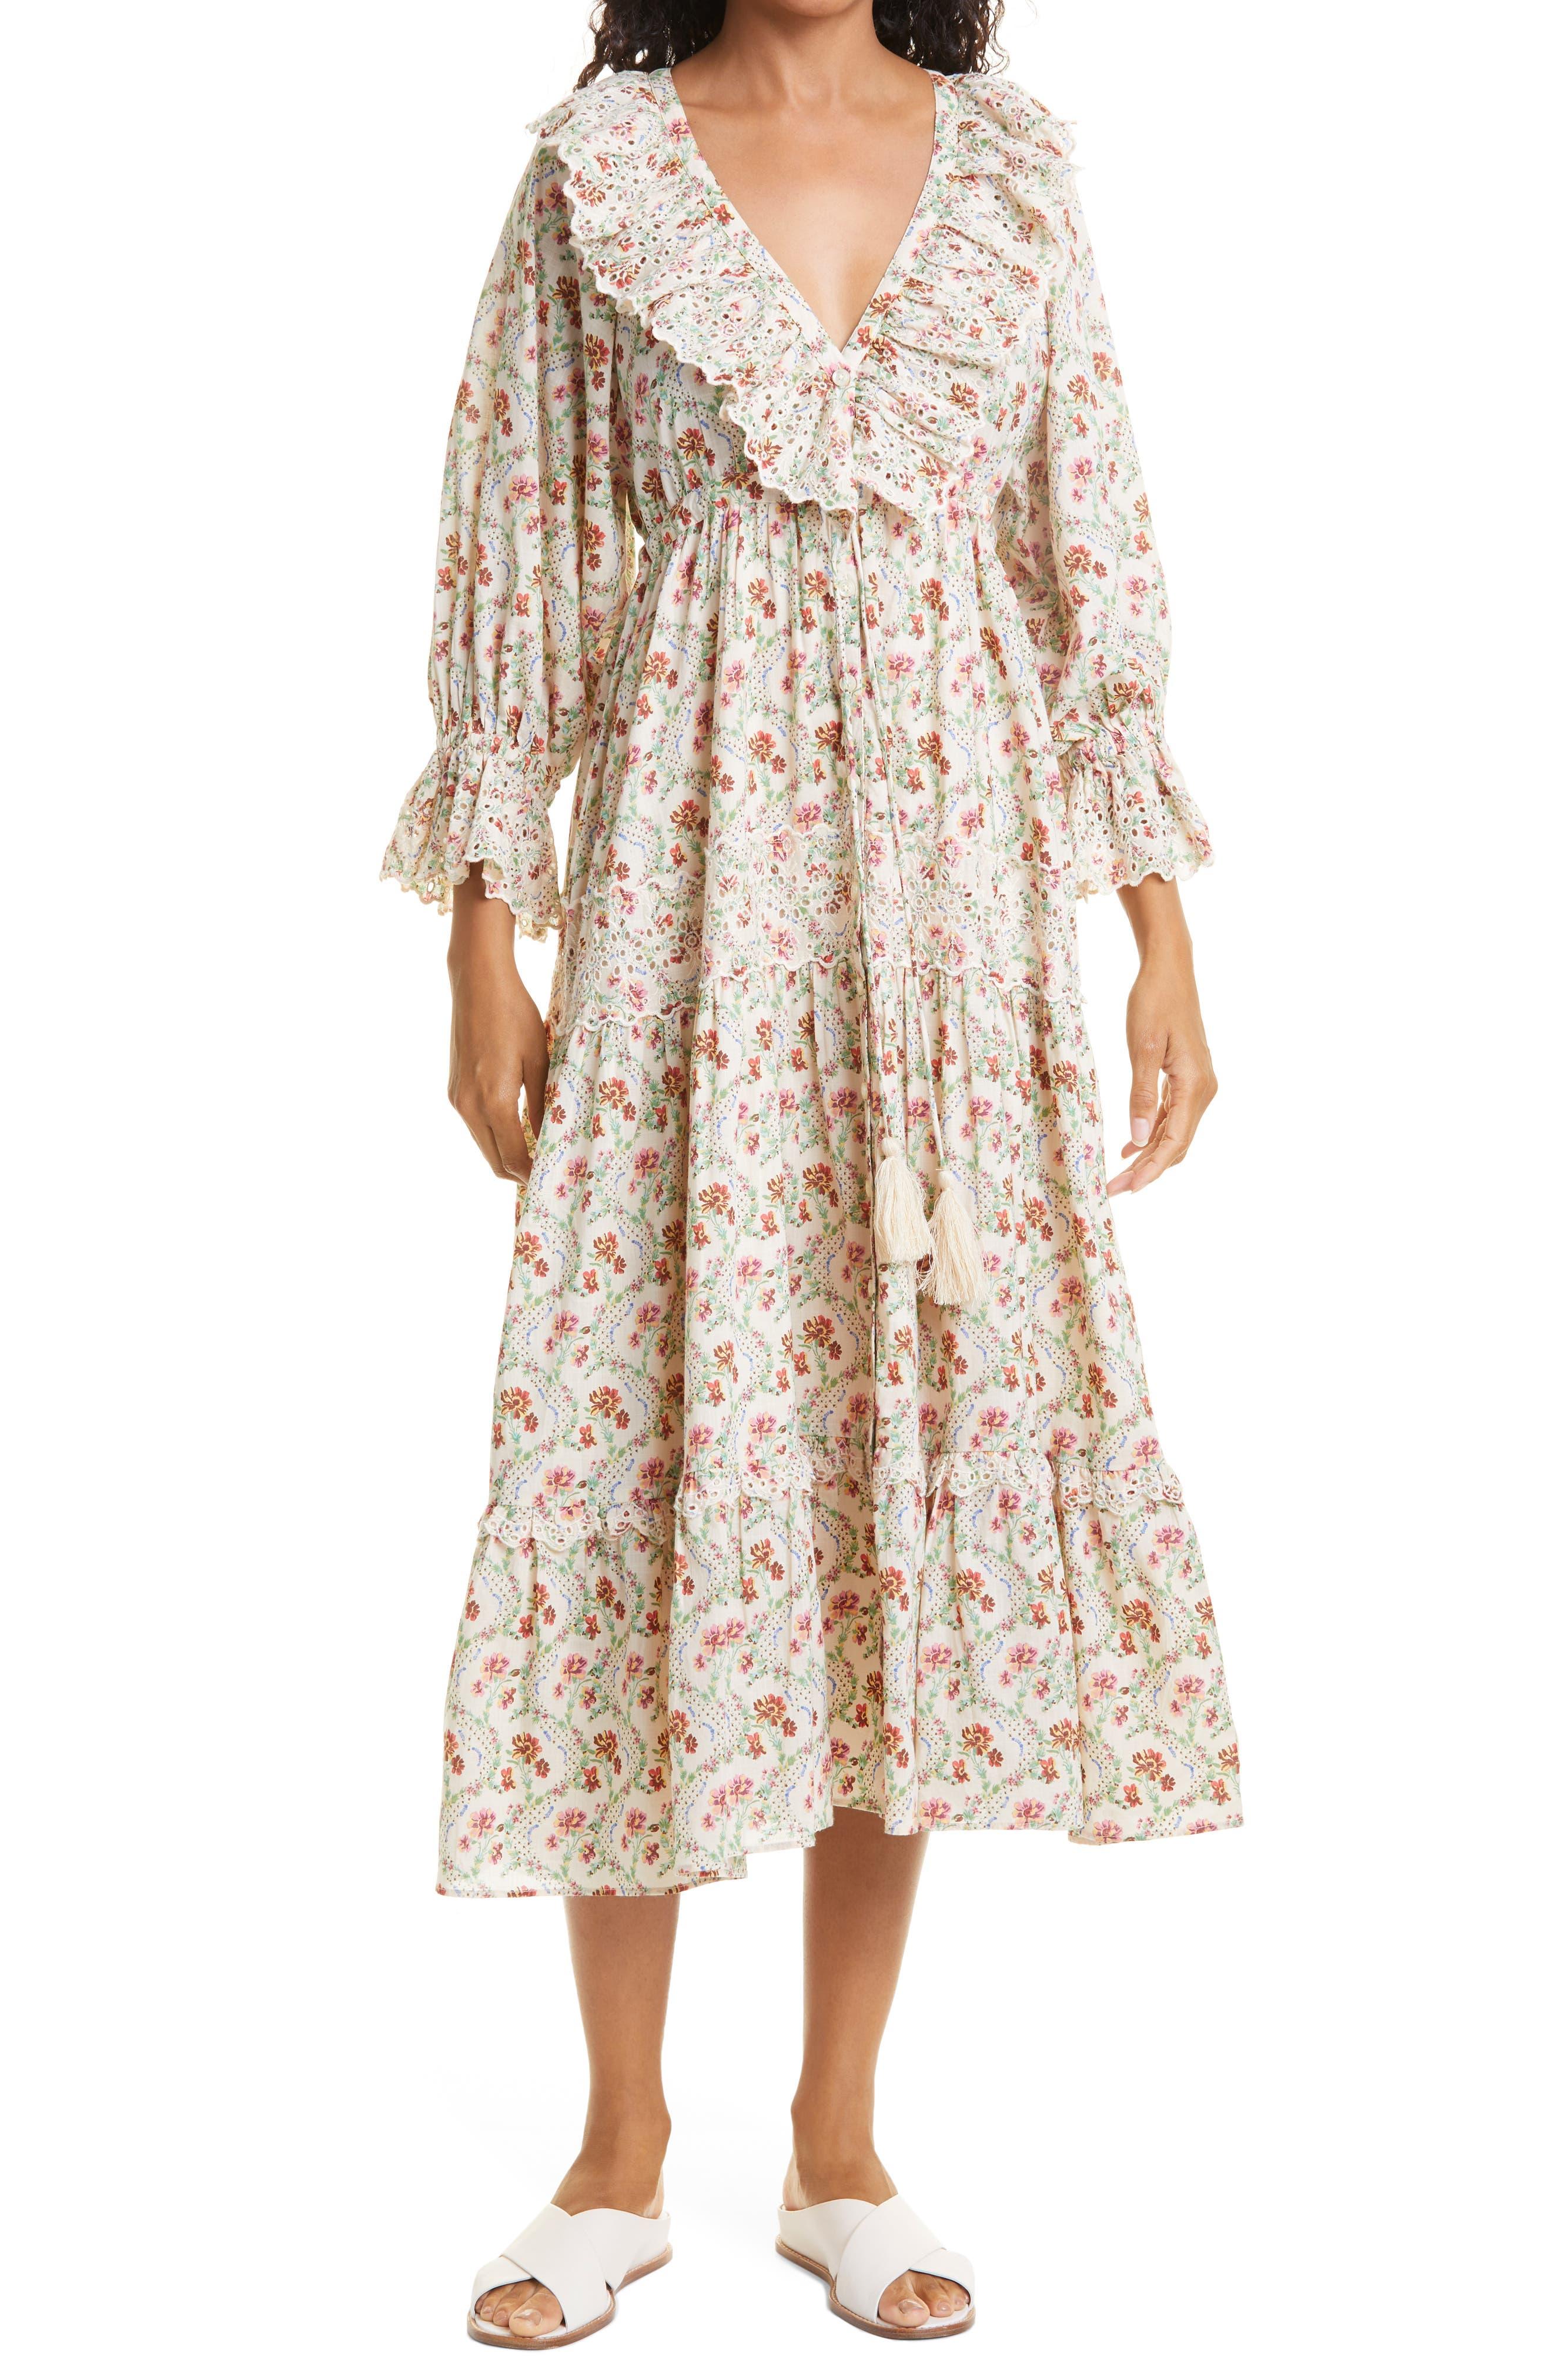 Floral Eyelet Trim Midi Dress